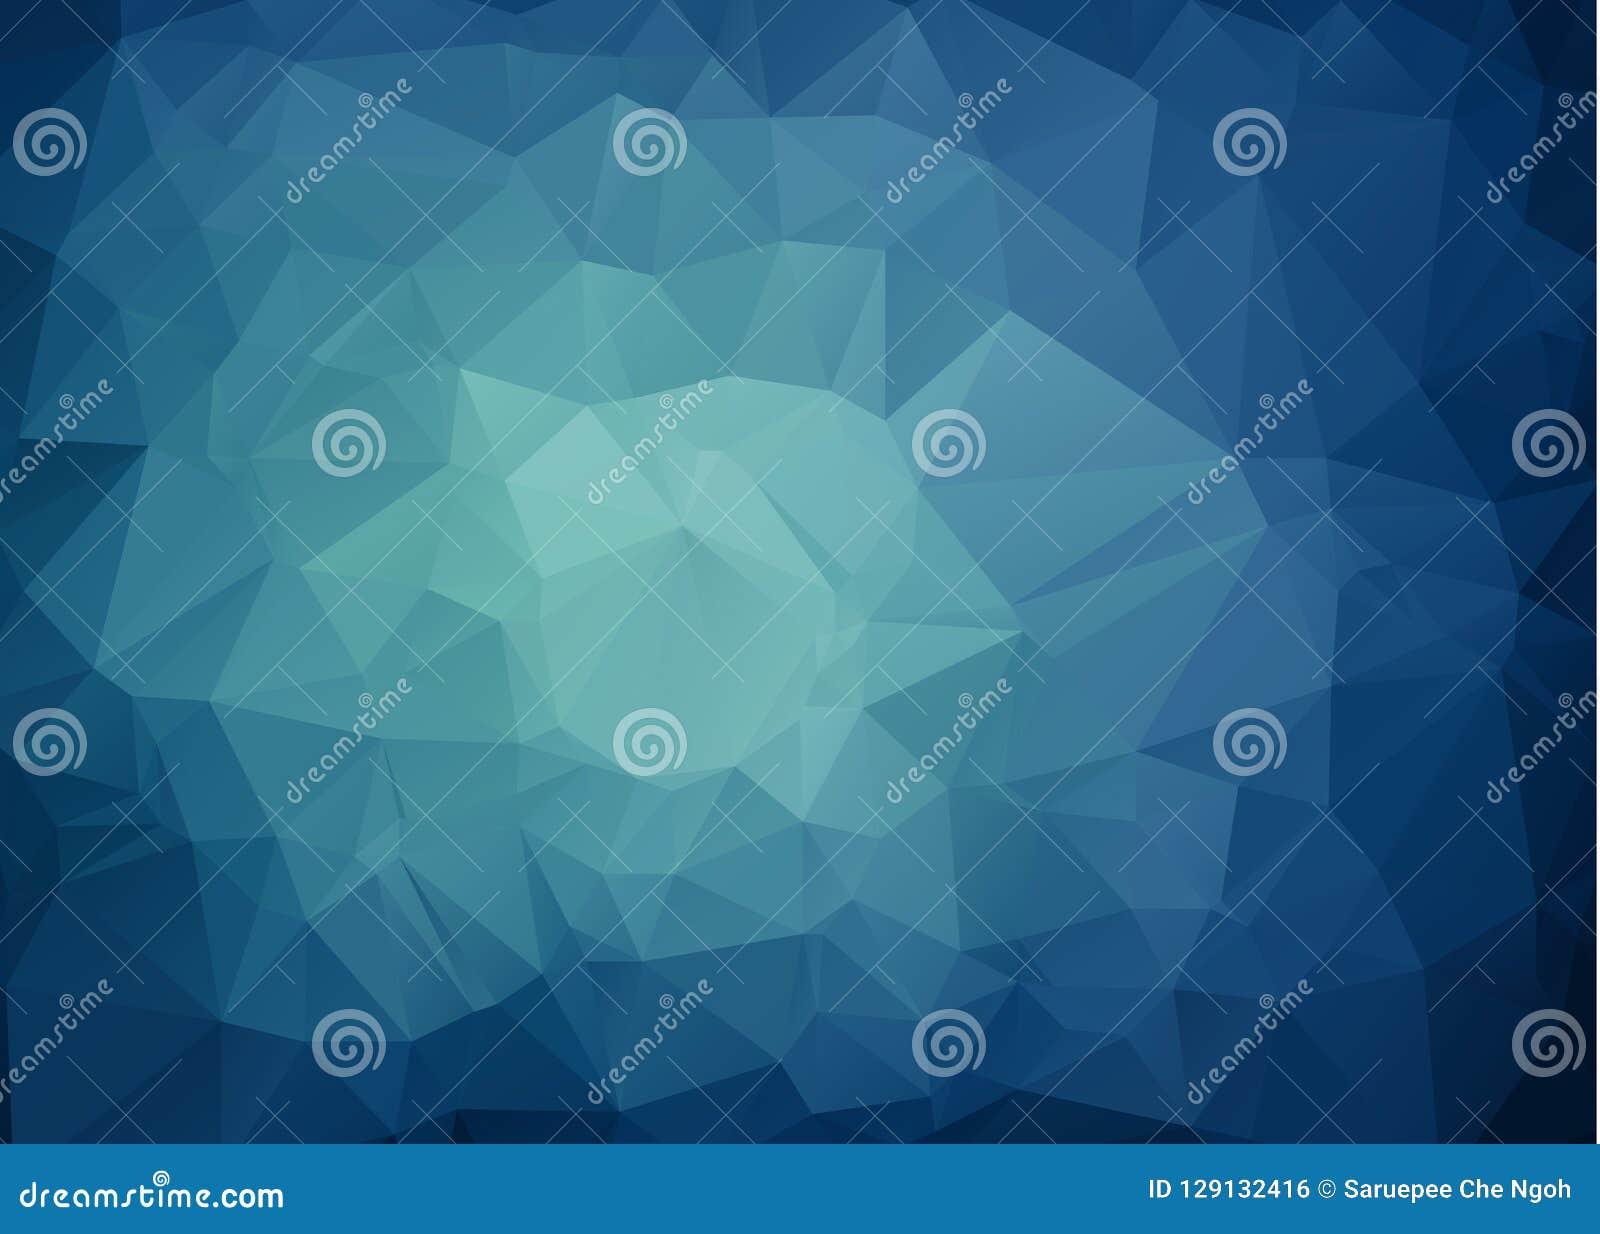 multicolor dark blue geometric rumpled triangular low poly style gradient illustration graphic background. Vector polygonal design